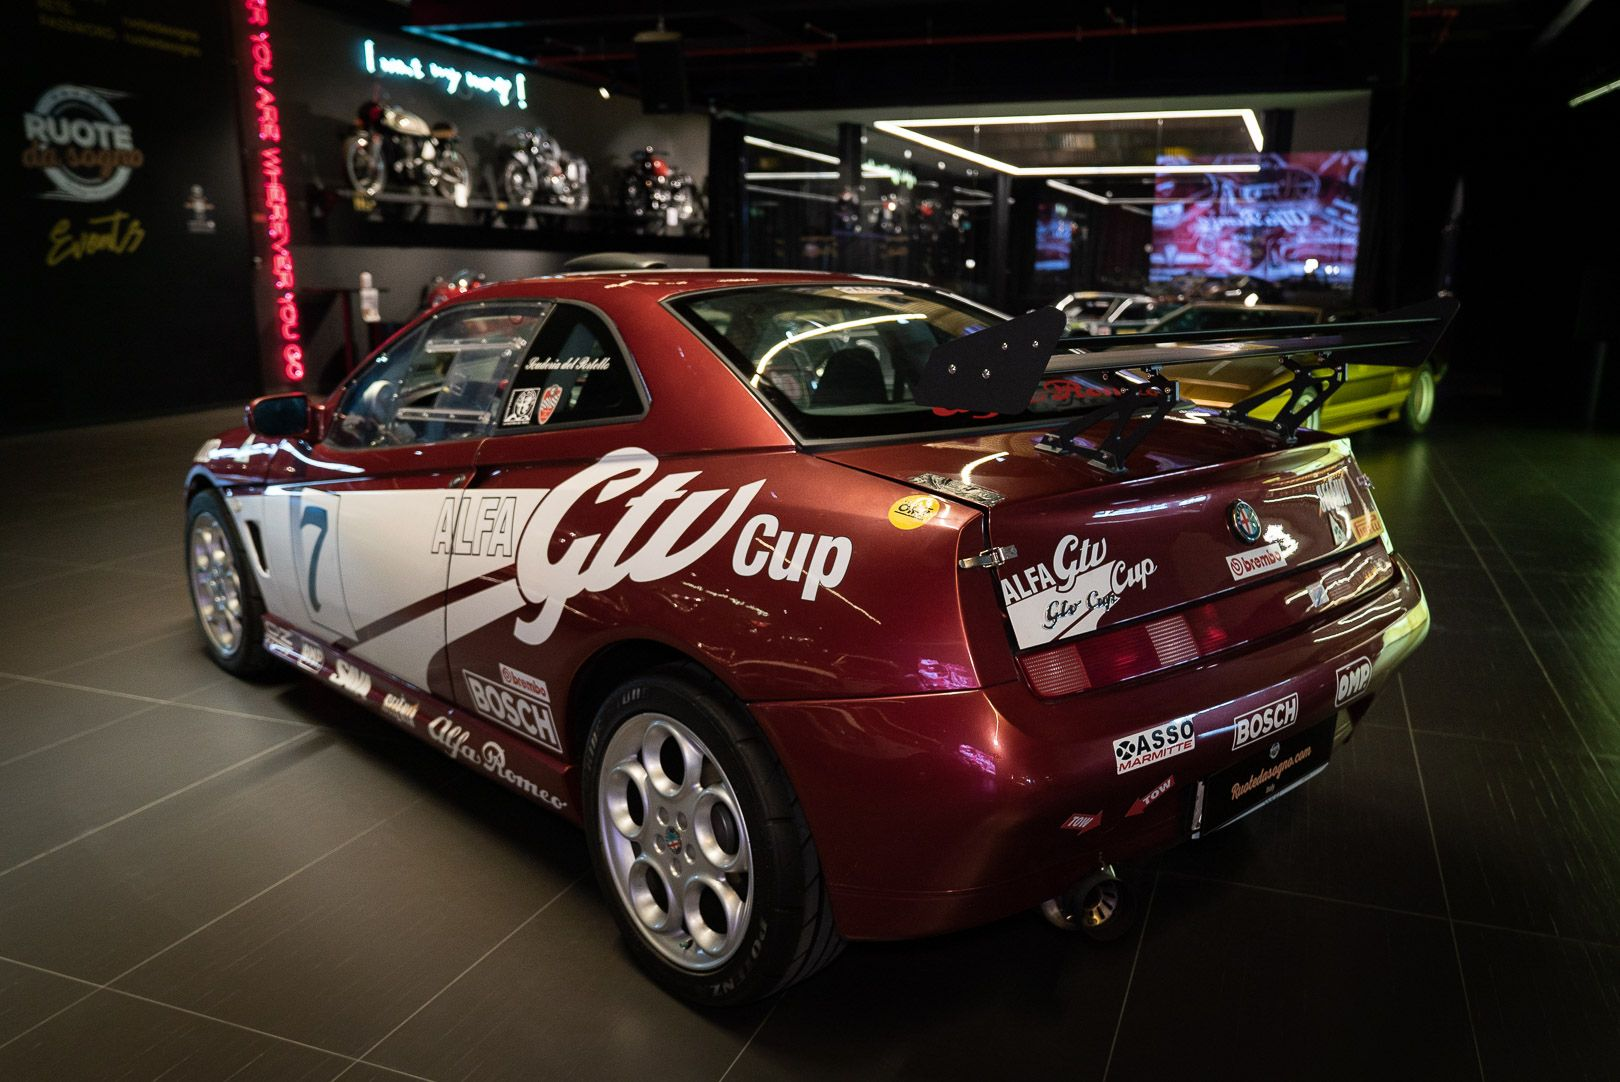 1995 Alfa Romeo GTV 2.0 V6 Turbo Cup Replica 59901